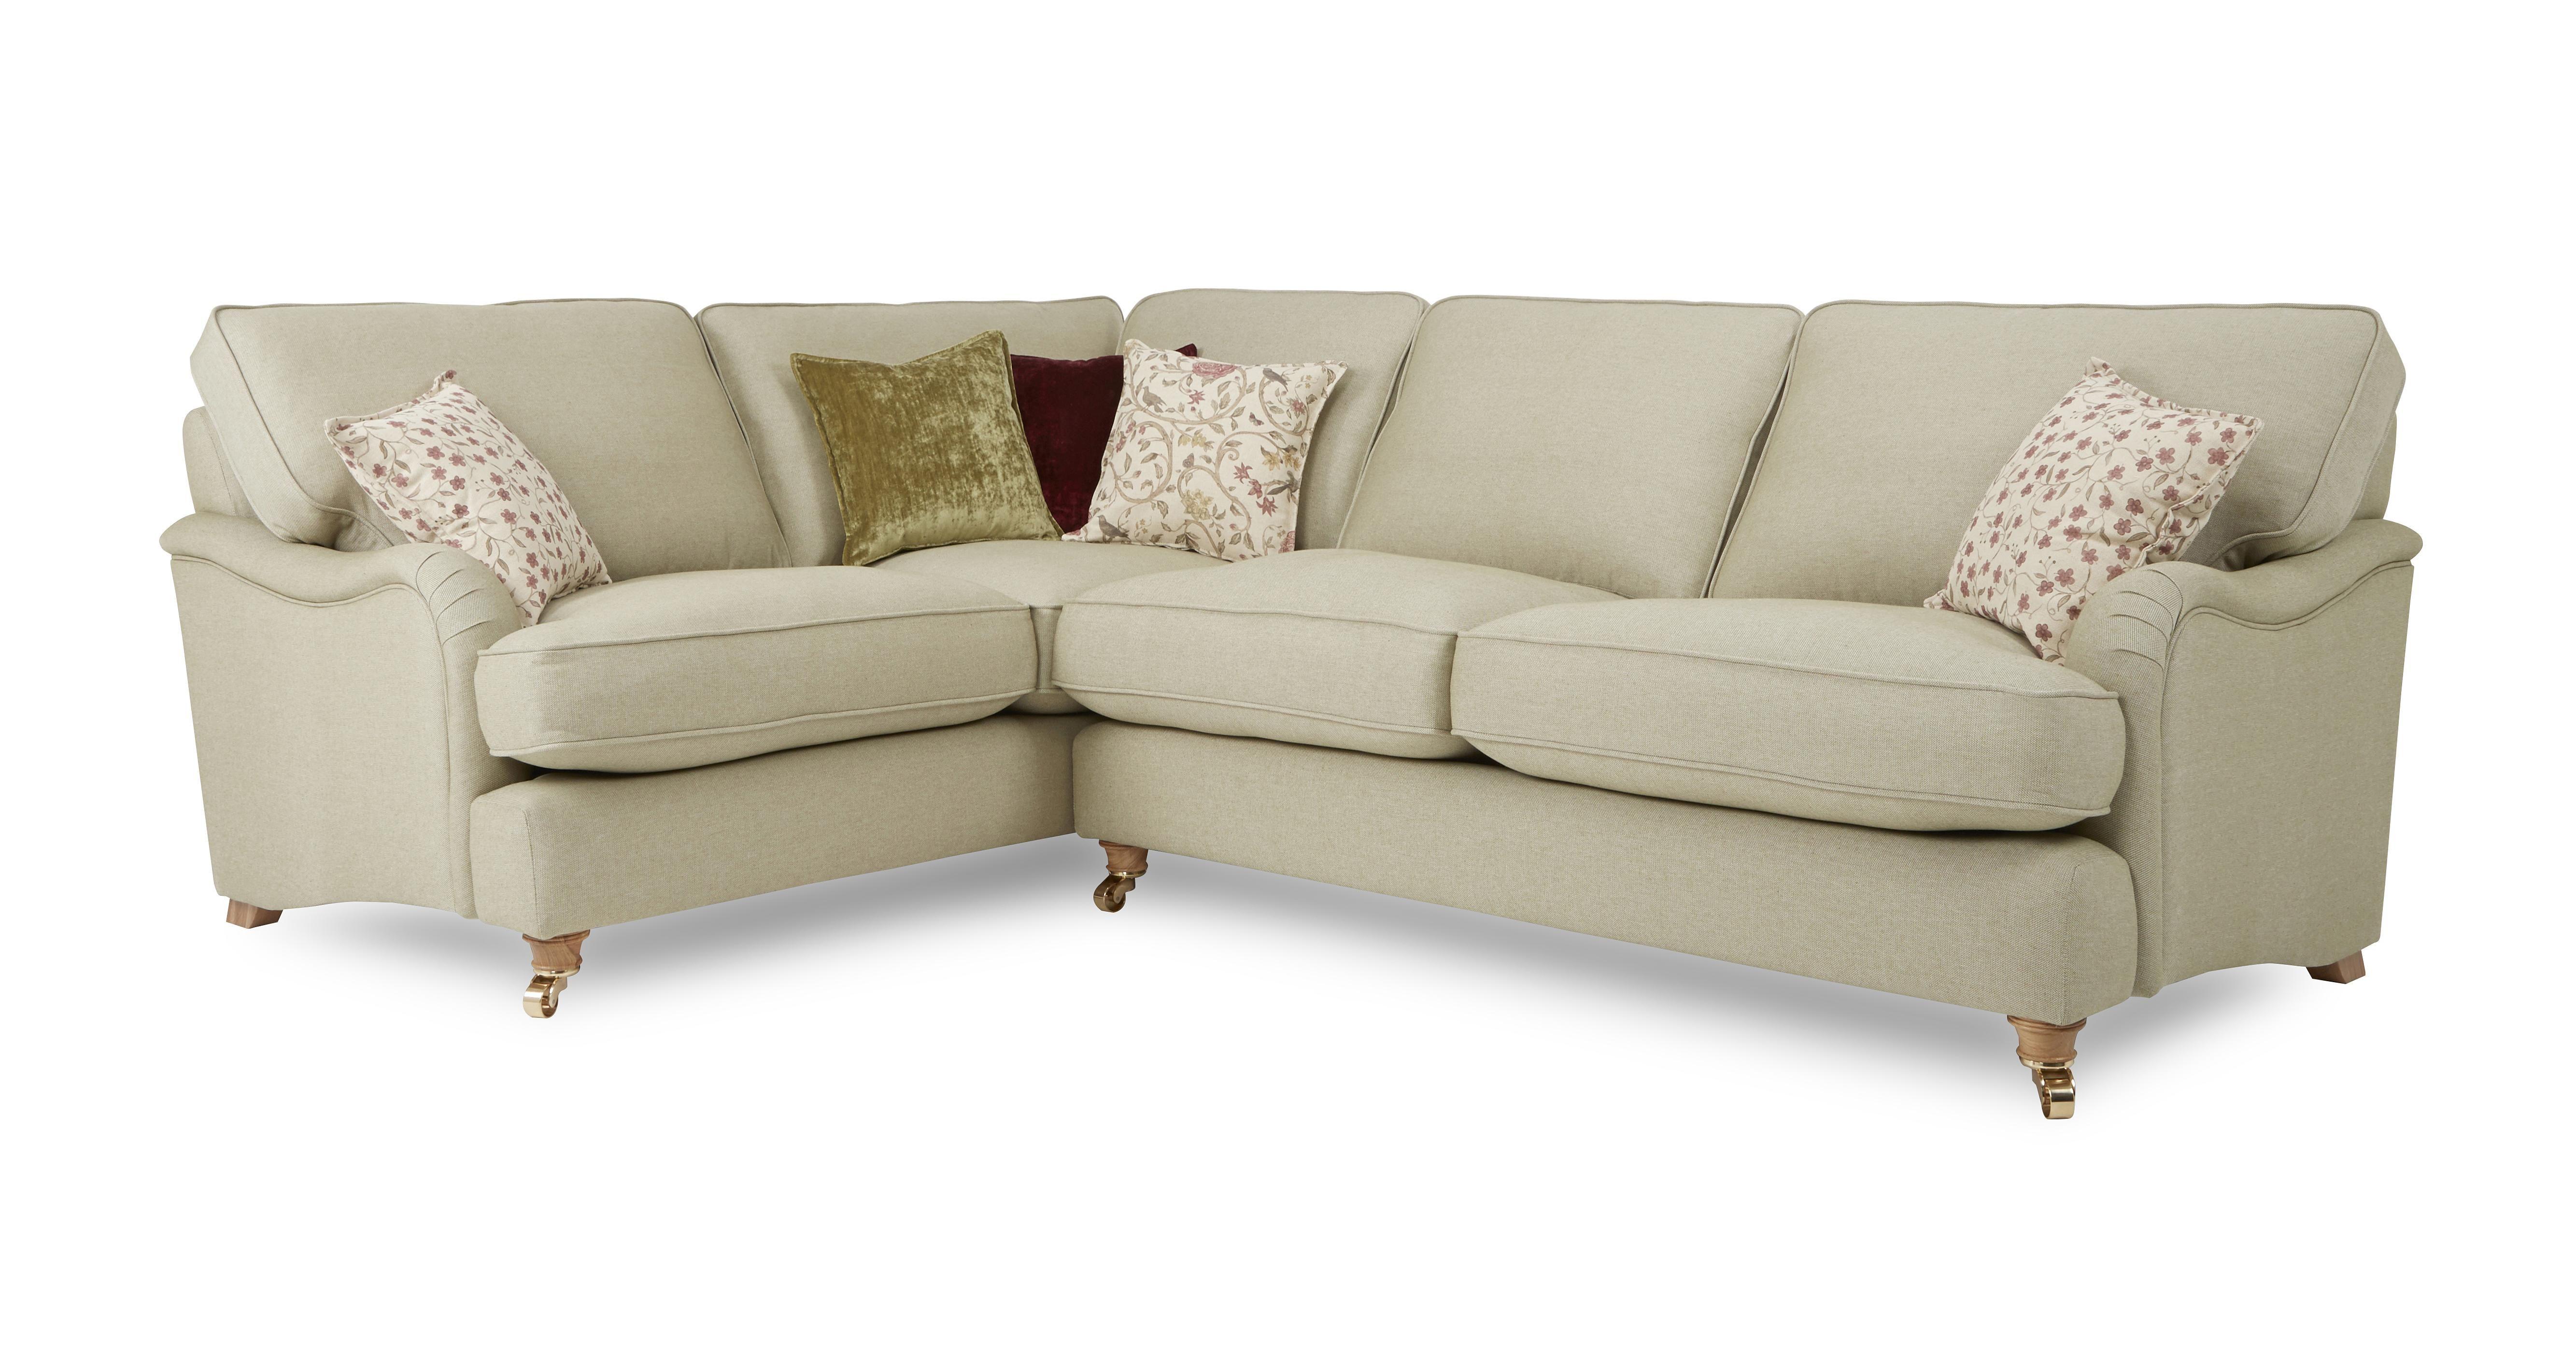 Gower Racing Plain Right Hand Facing 3 Seater Corner Sofa In 2020 Sofa 3 Piece Corner Sofa